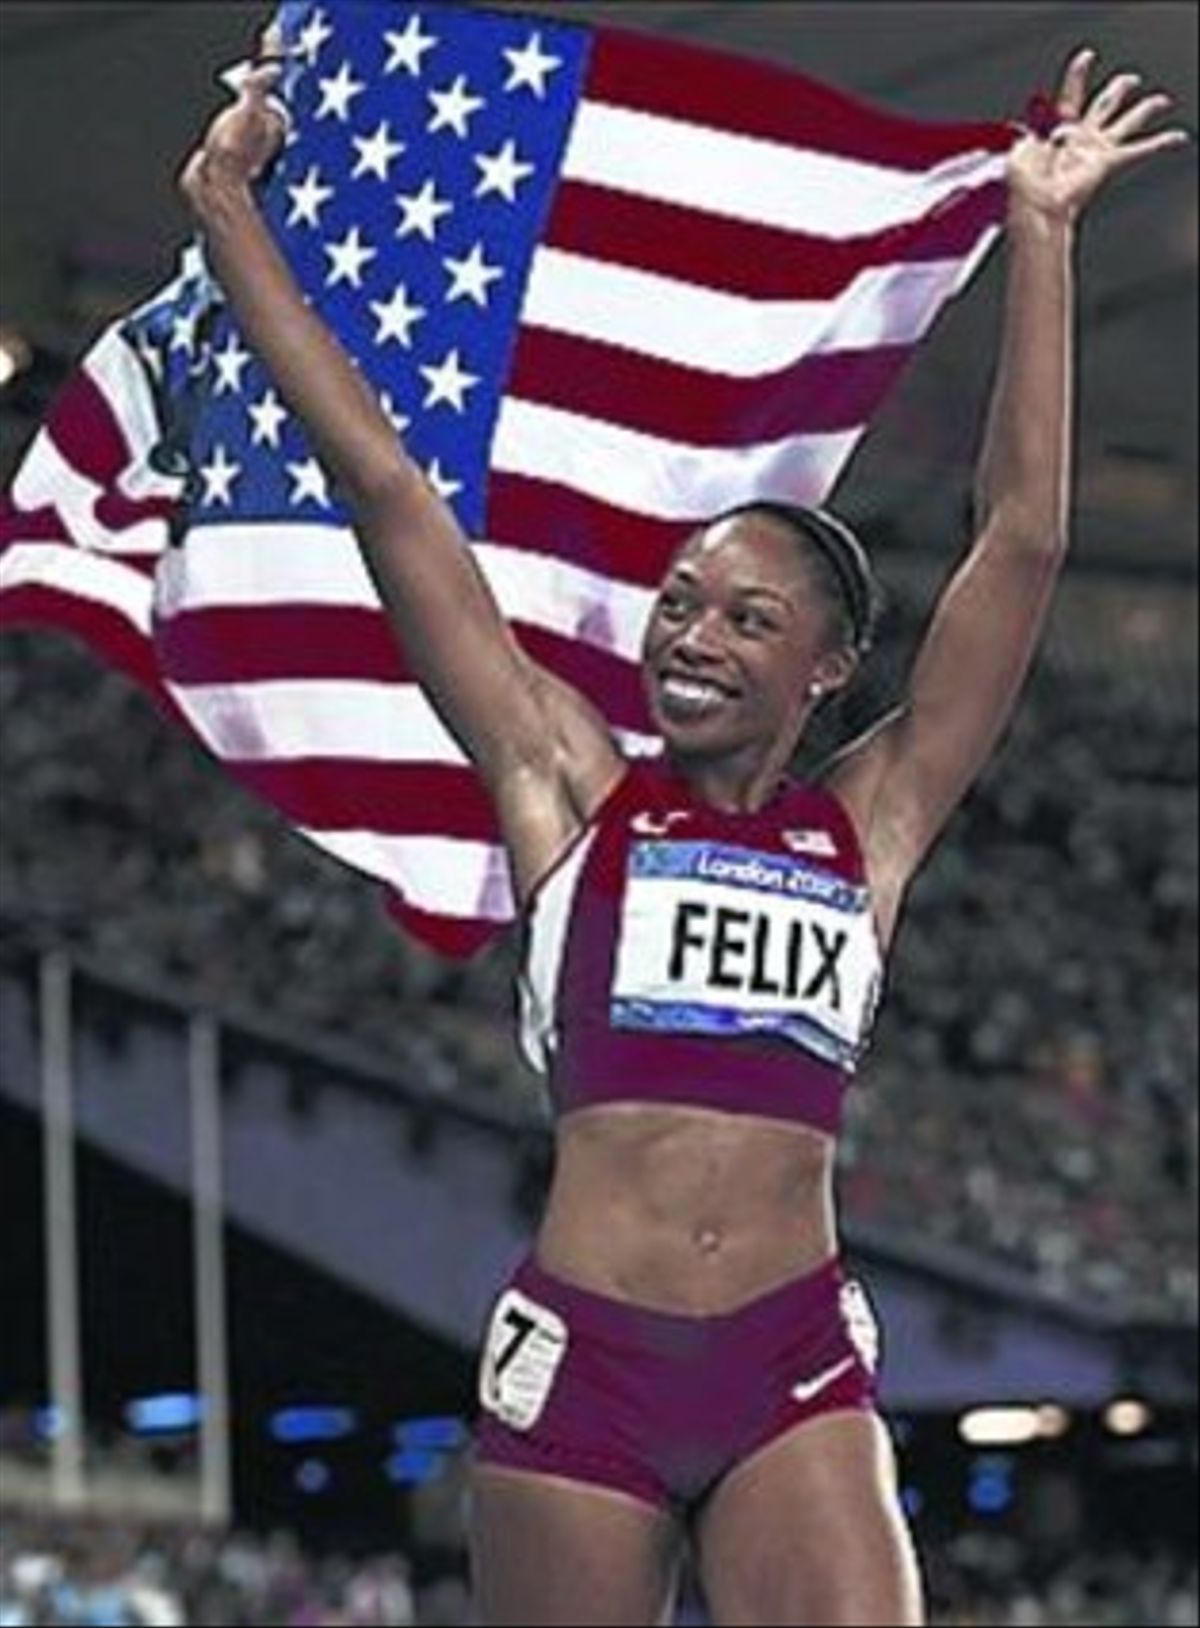 La estadounidense Allyson Felix